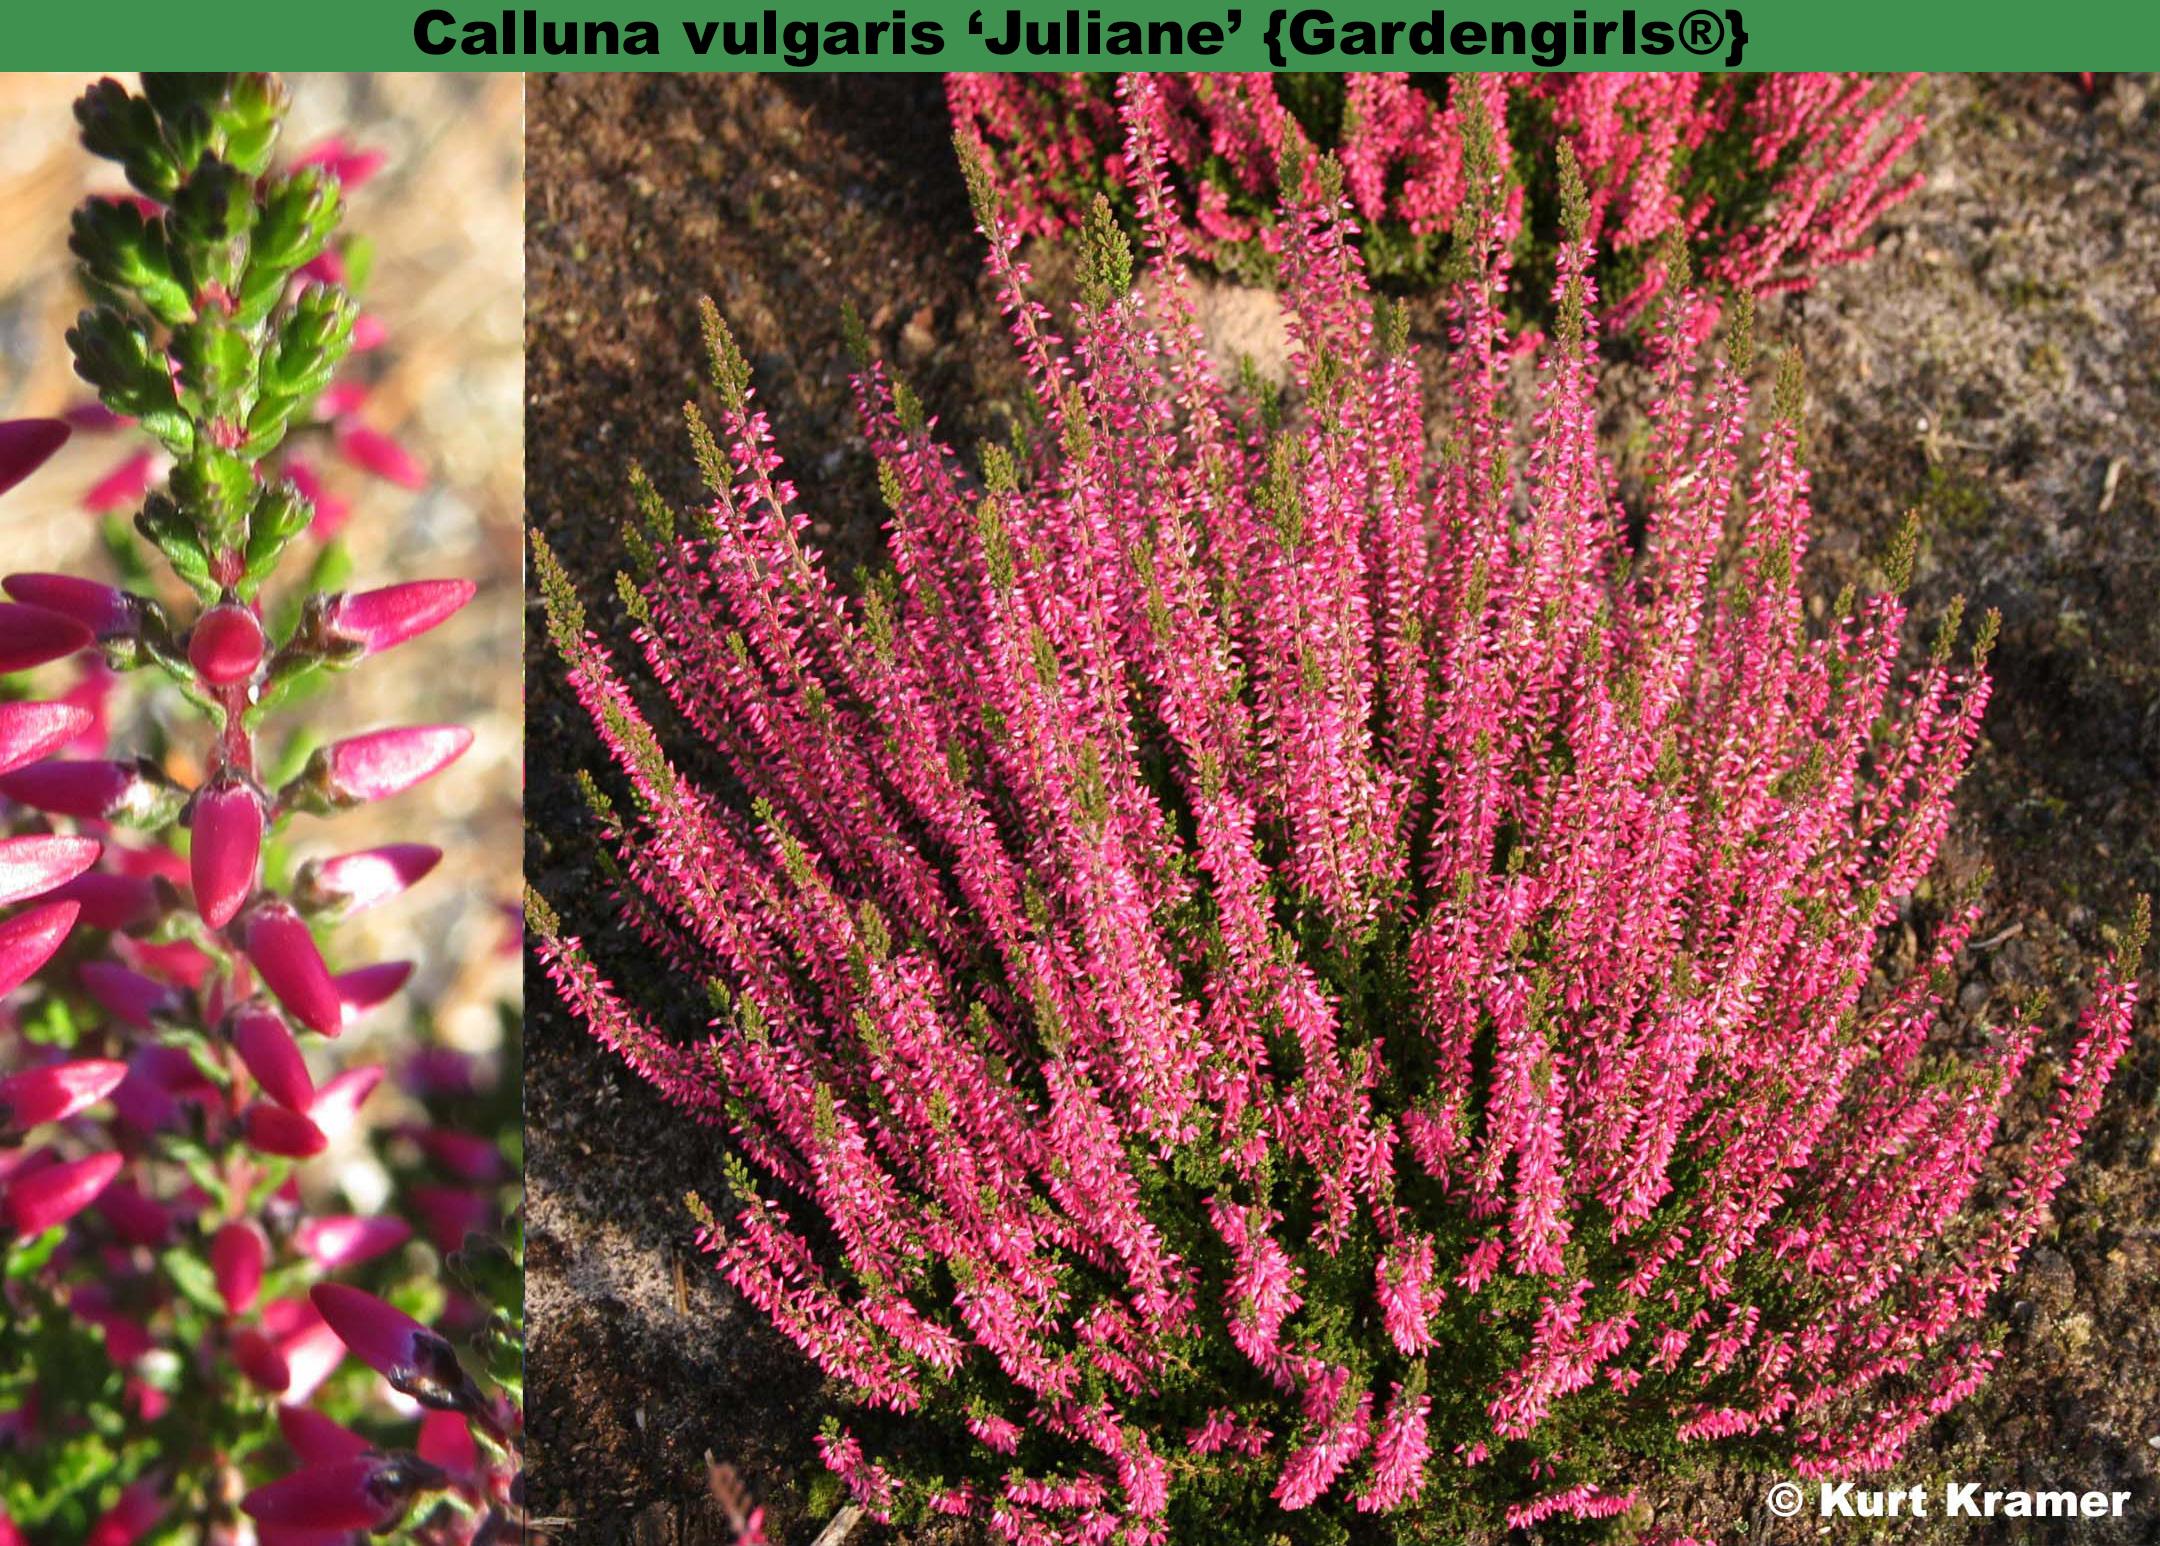 The heather society for Calluna vulgaris